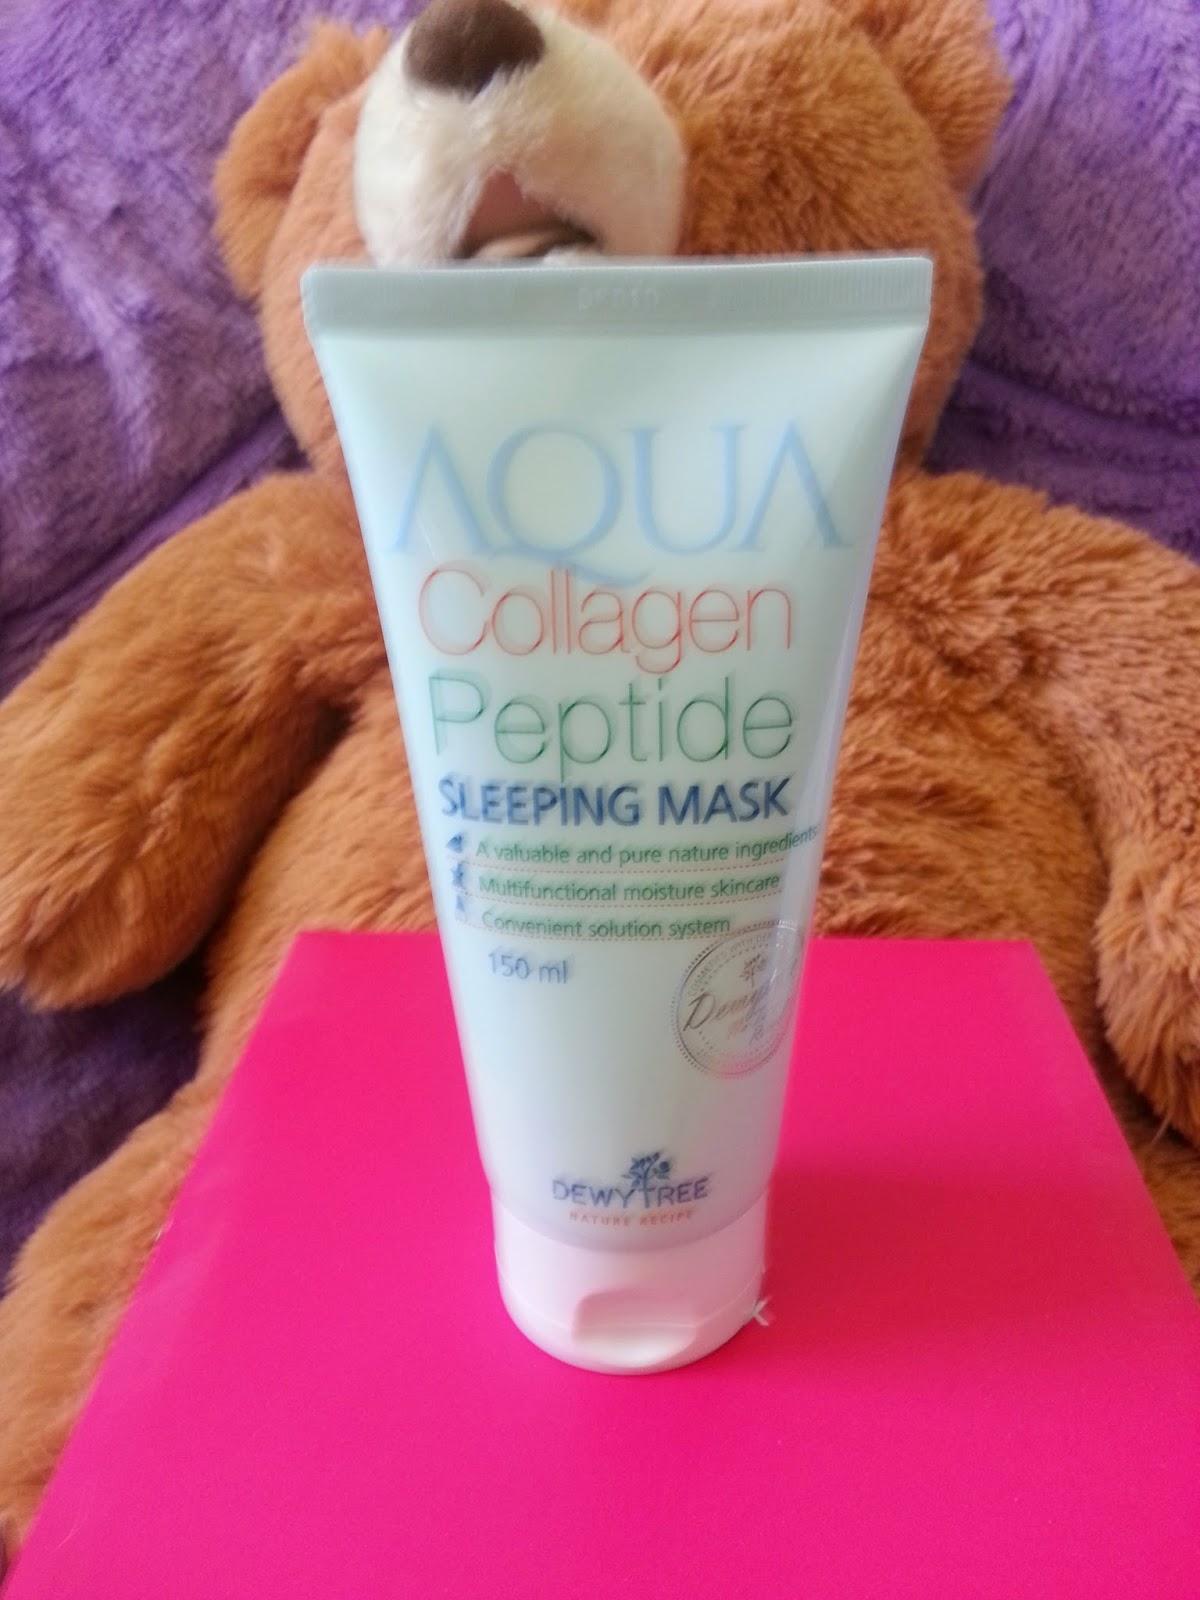 Dewytree Aqua Collagen Peptide Sleep Mask